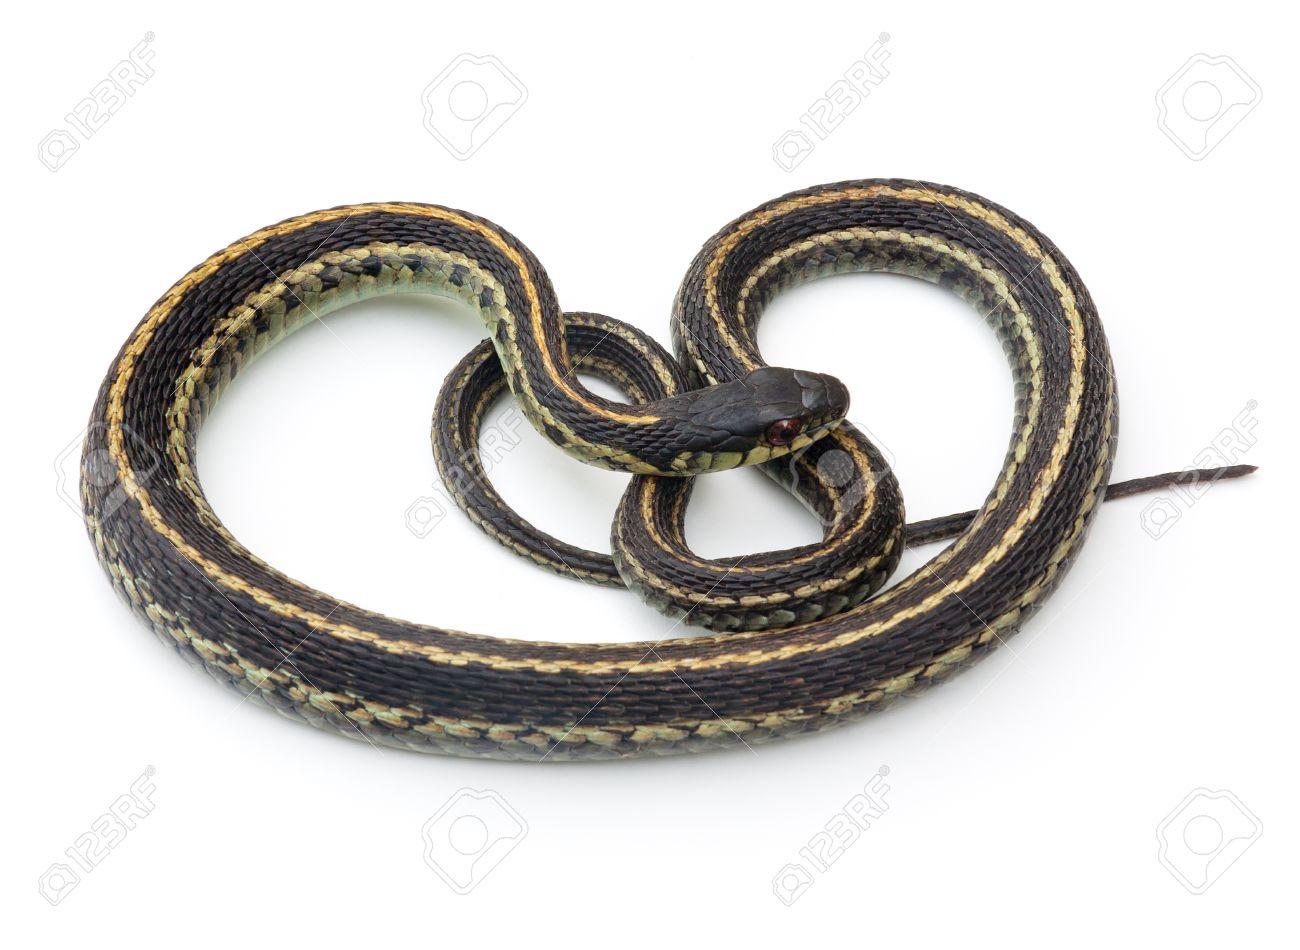 Eastern Garter Snake (Thamnophis sirtalis) on a white background Stock Photo - 9405386